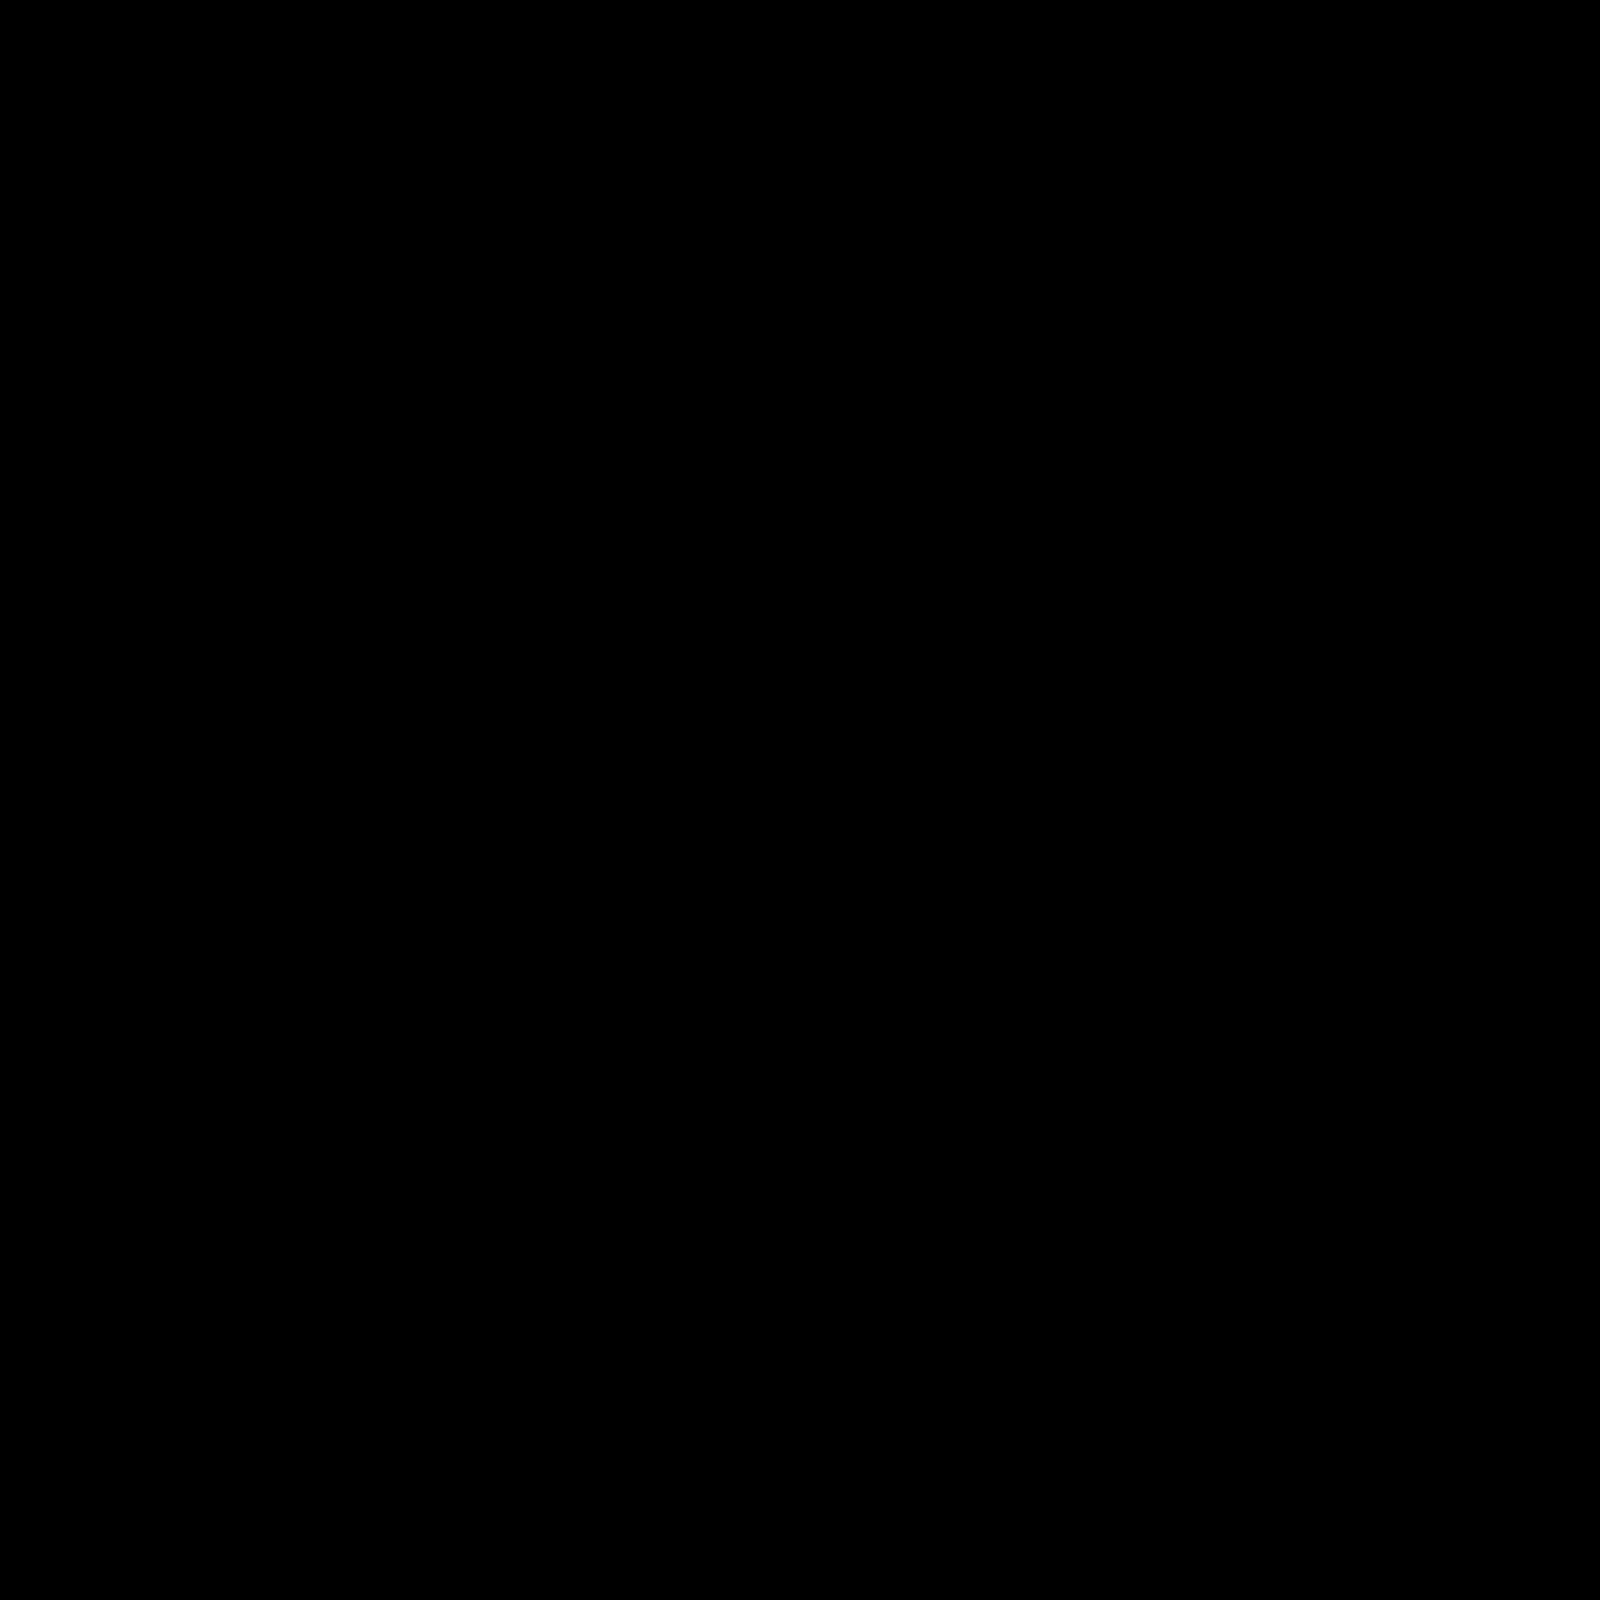 2019 icon